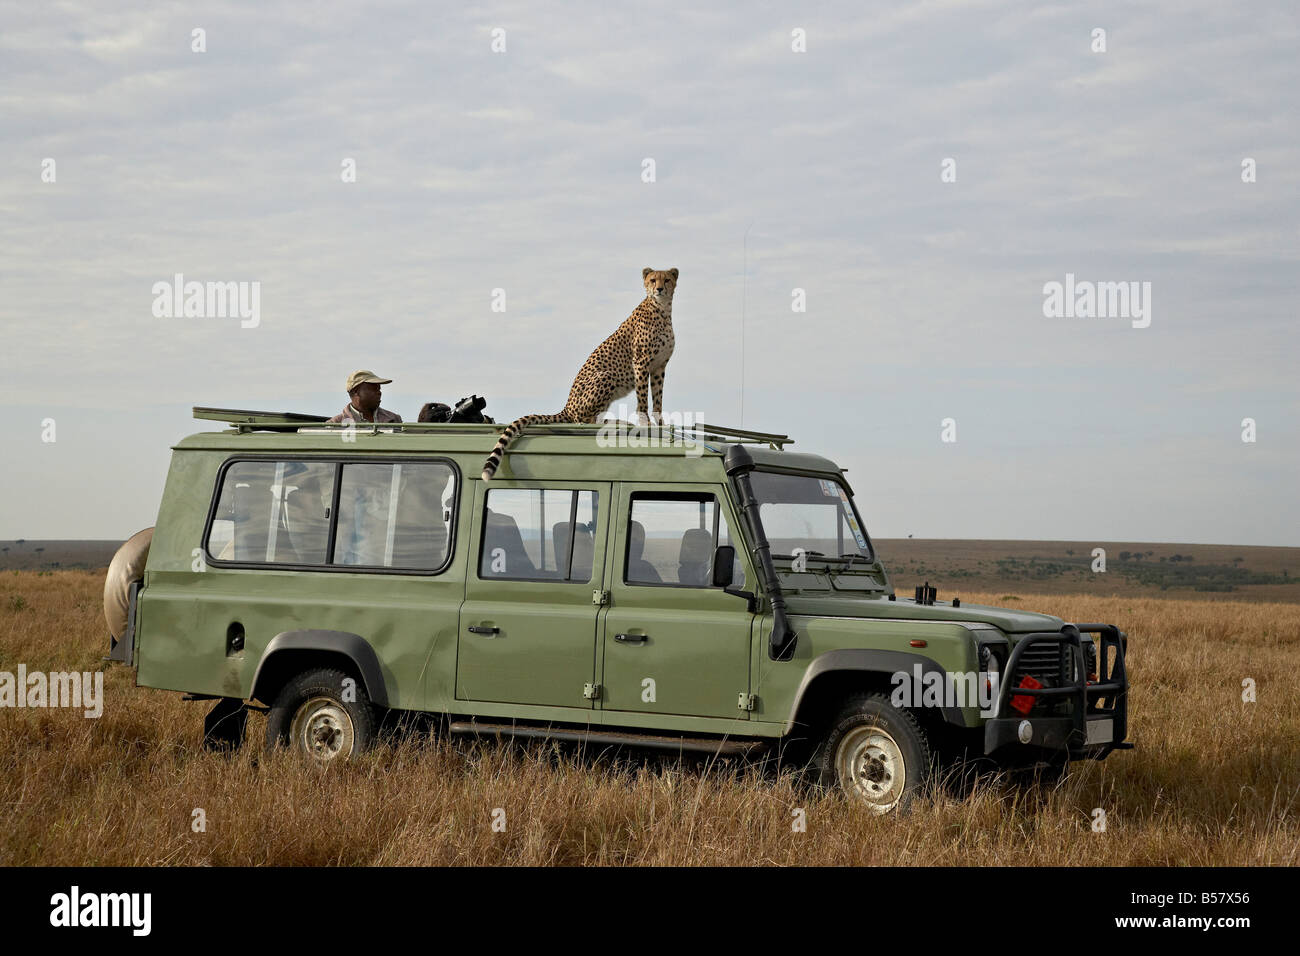 Gepard (Acinonyx Jubatus) auf Land Rover Safari Fahrzeug, Masai Mara National Reserve, Kenia, Ostafrika, Afrika Stockfoto